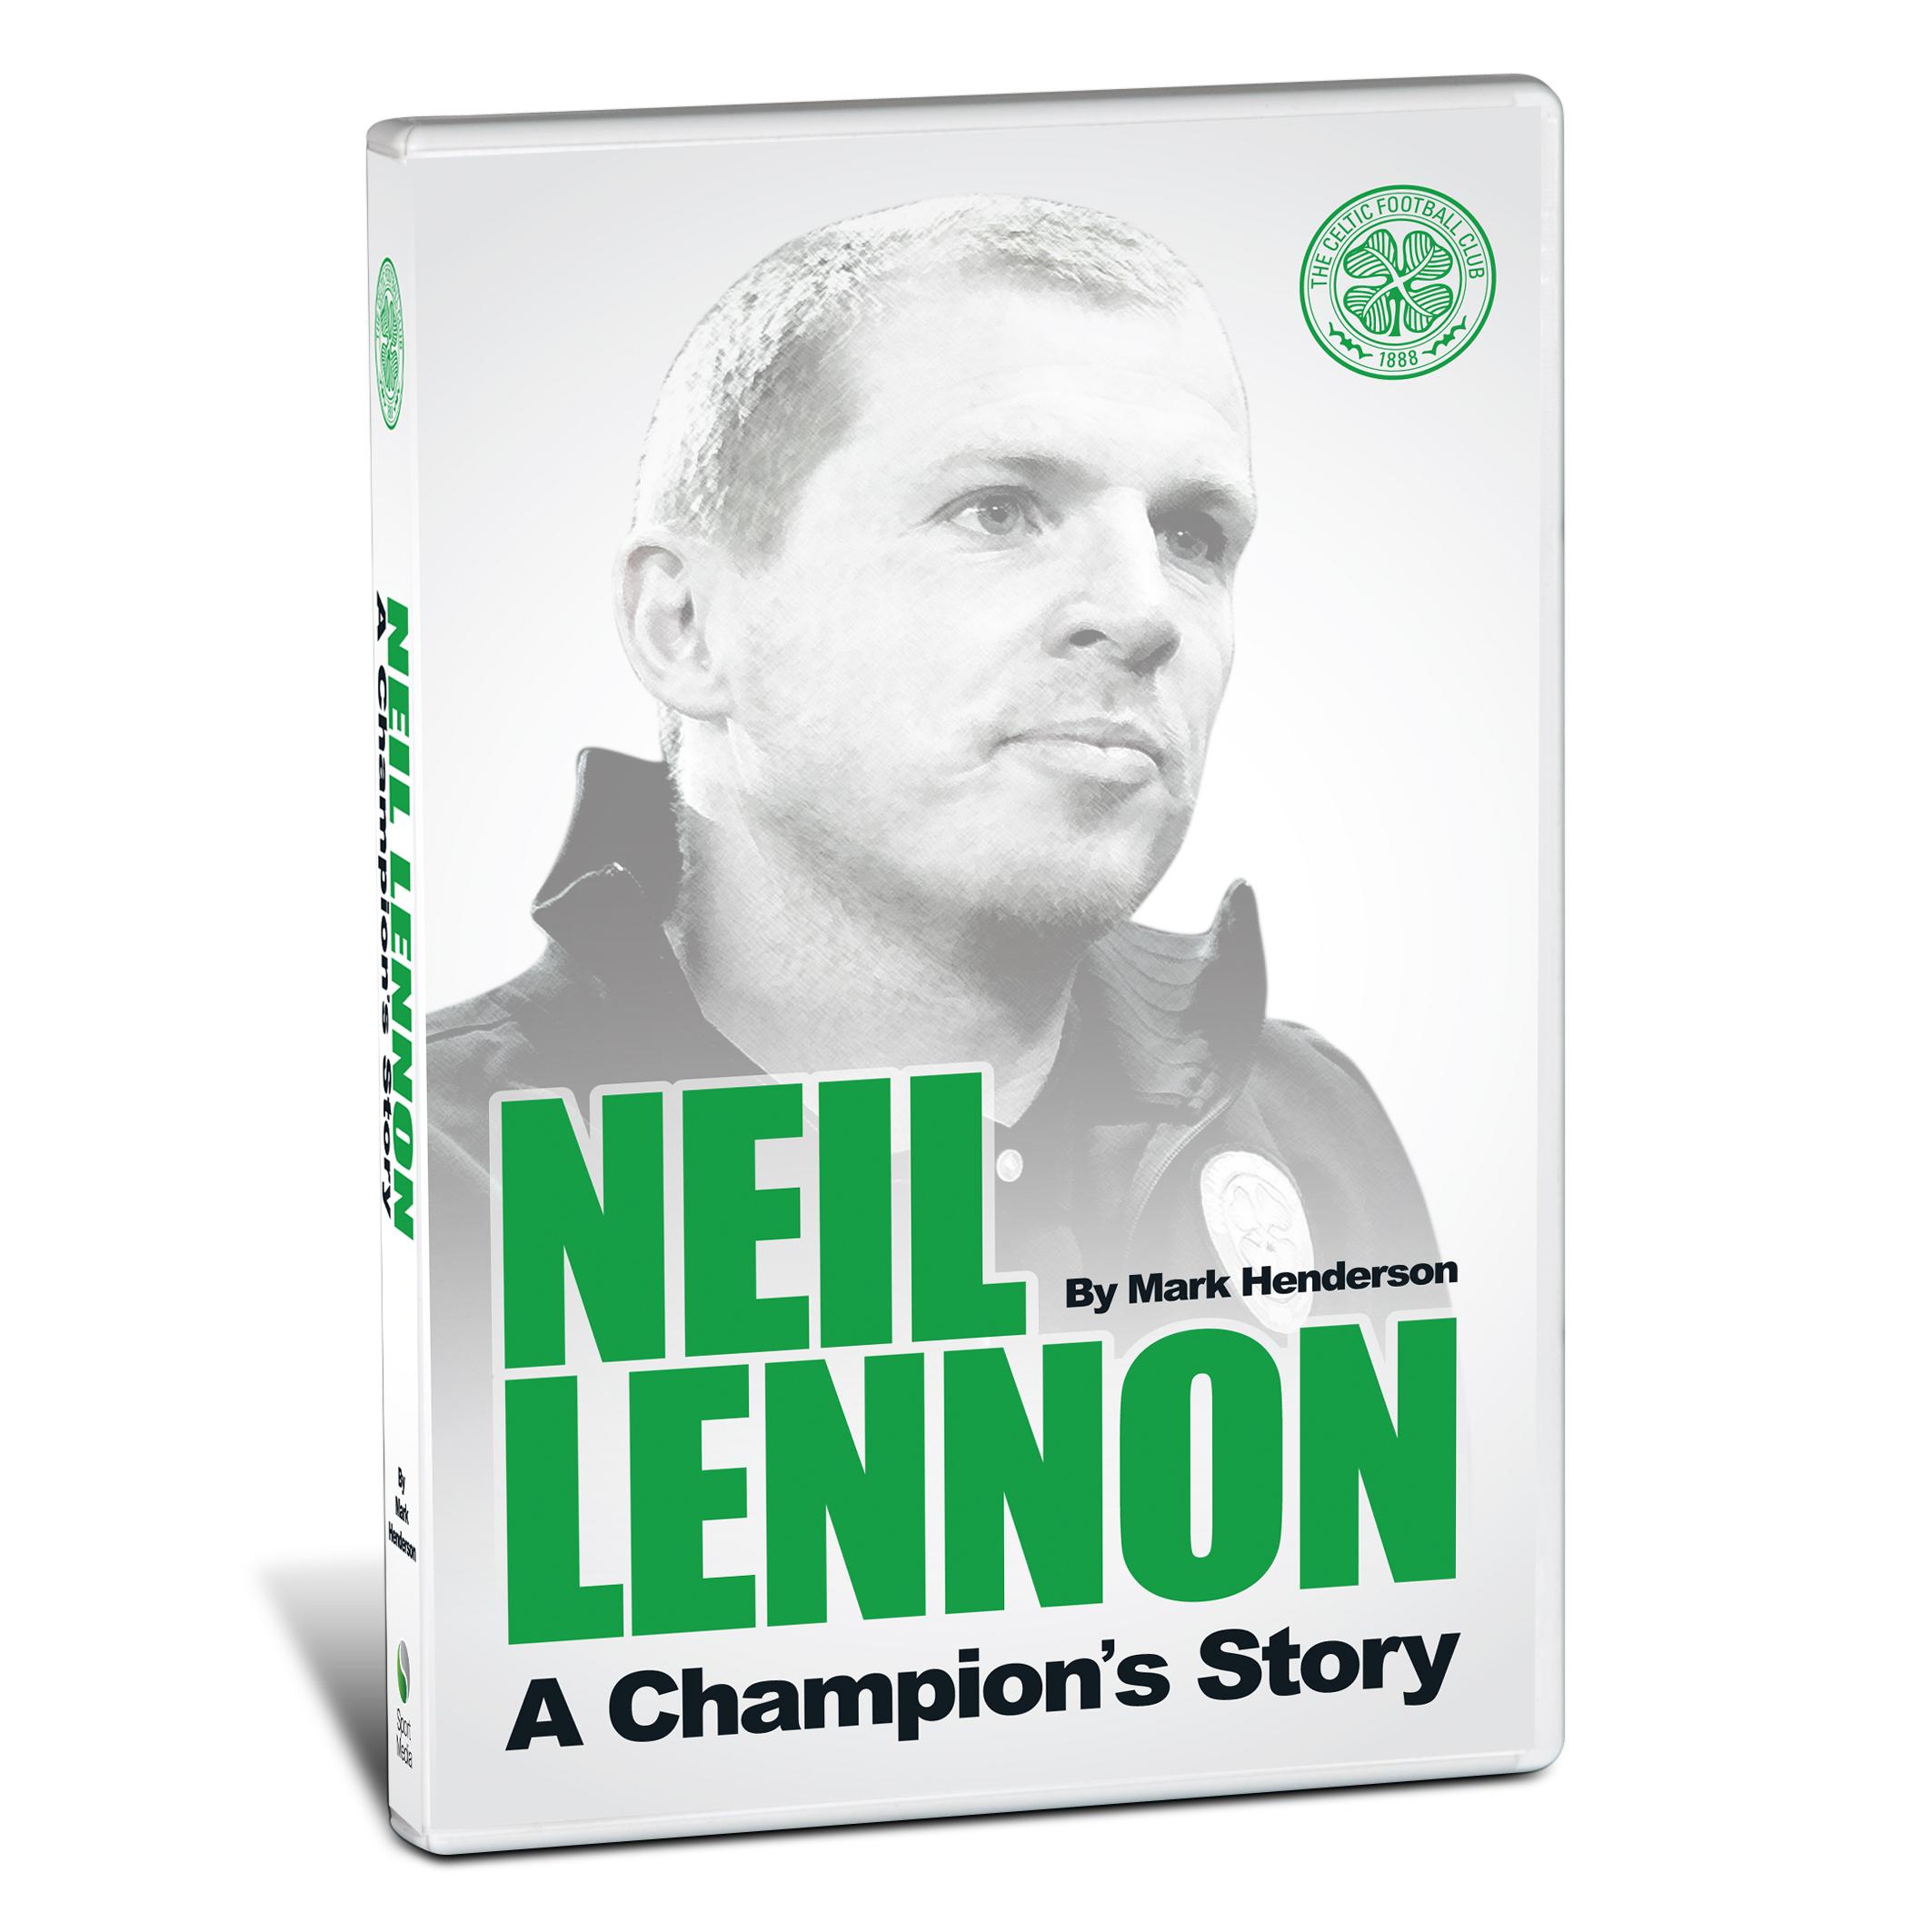 Celtic Neil Lennon A Champions Story - Book